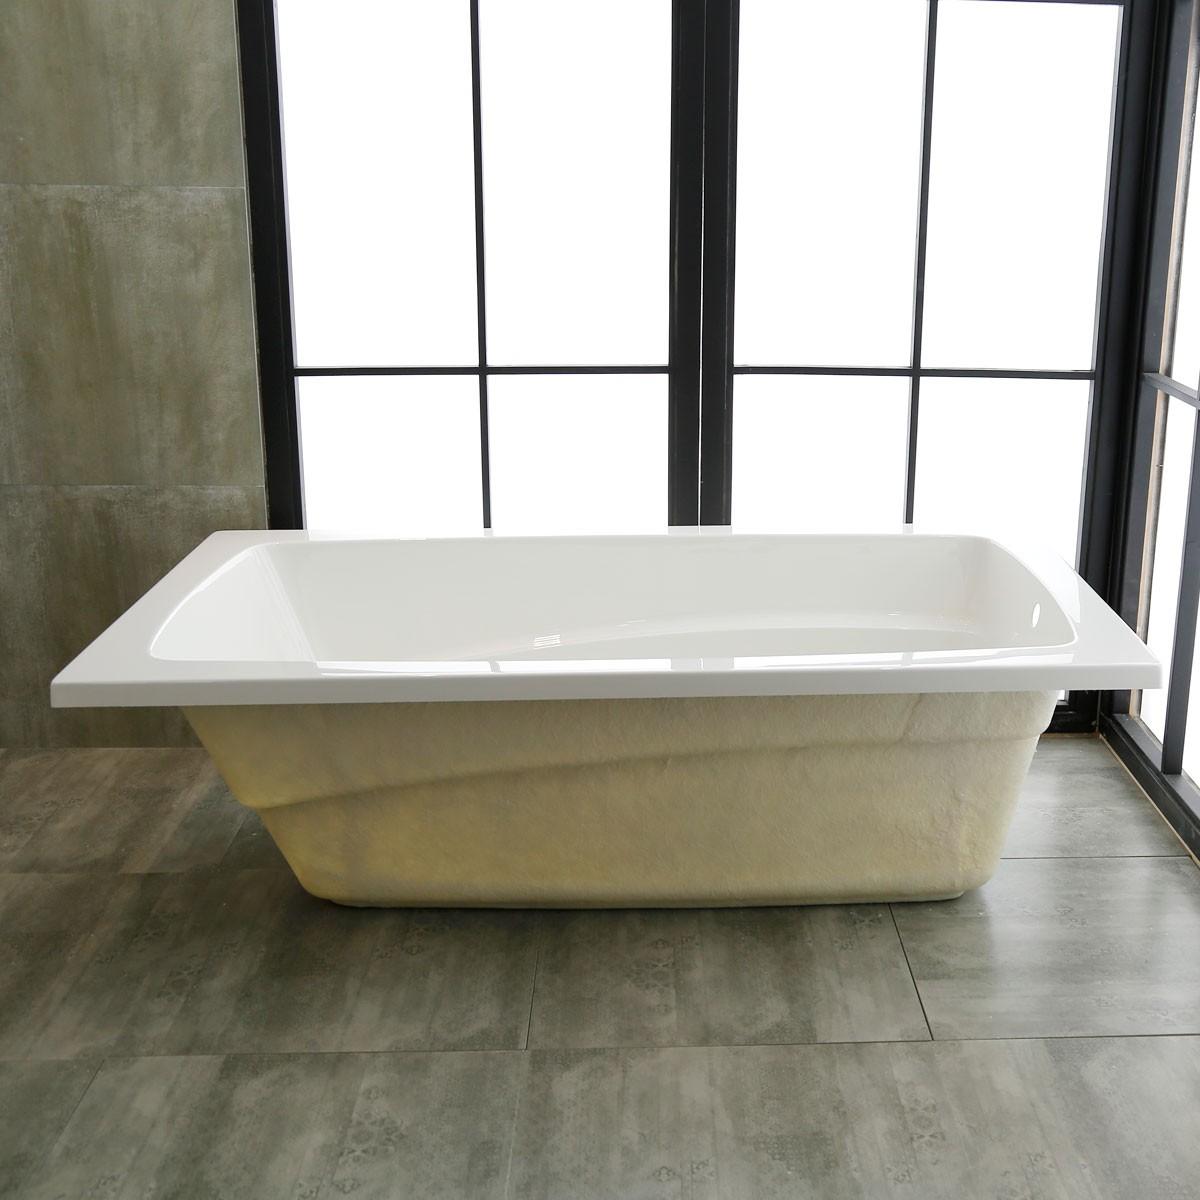 66 X 36 In Drop In Bathtub   Acrylic White (DK K14791